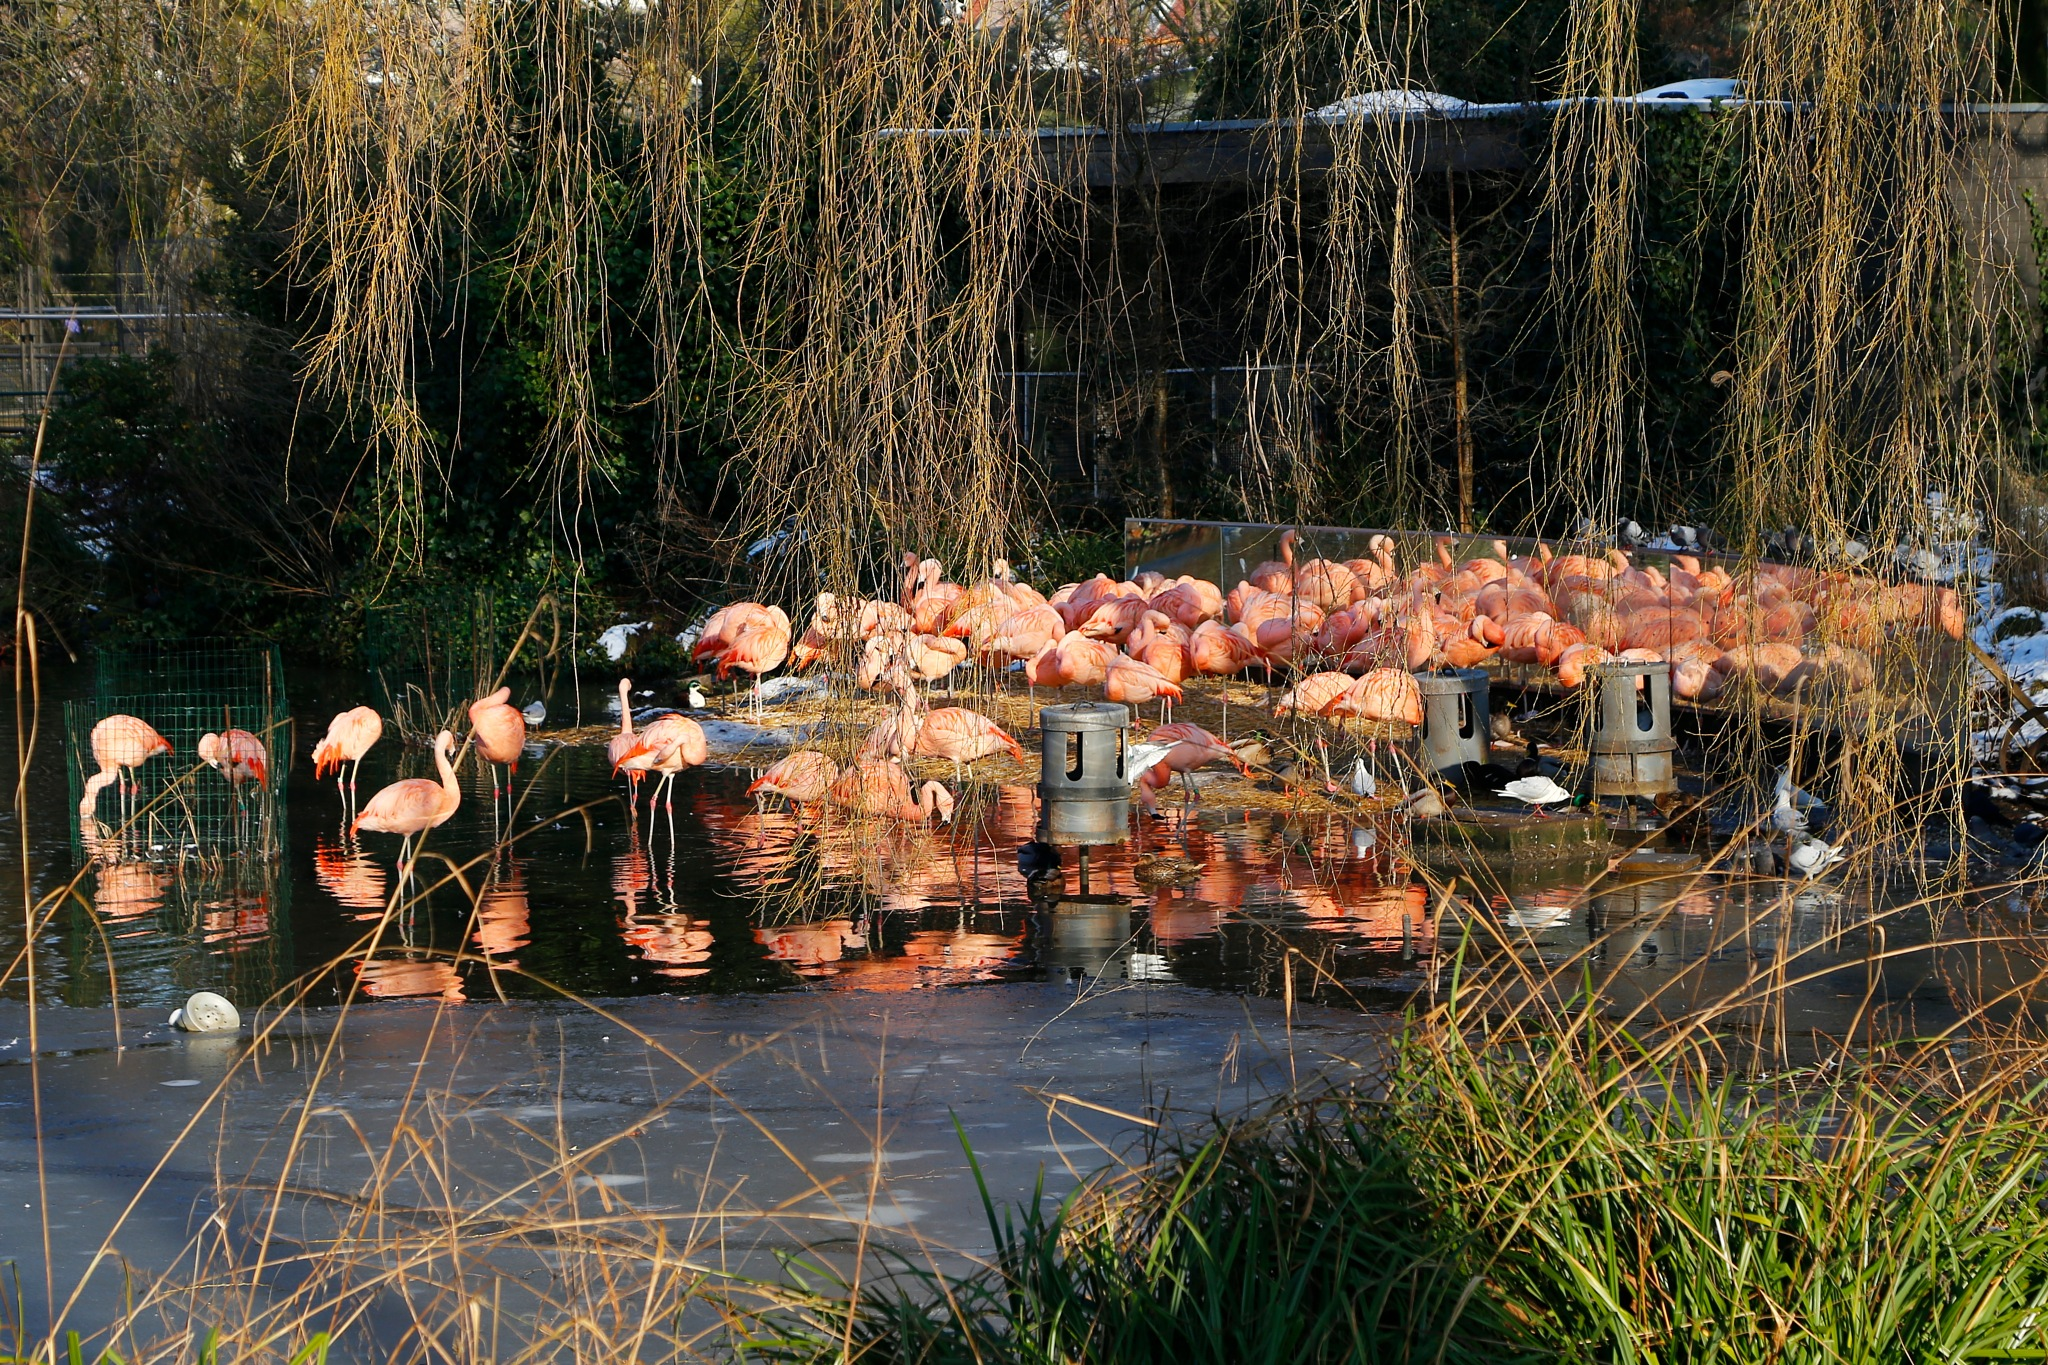 Flamingos in winter by Anders Weinberg